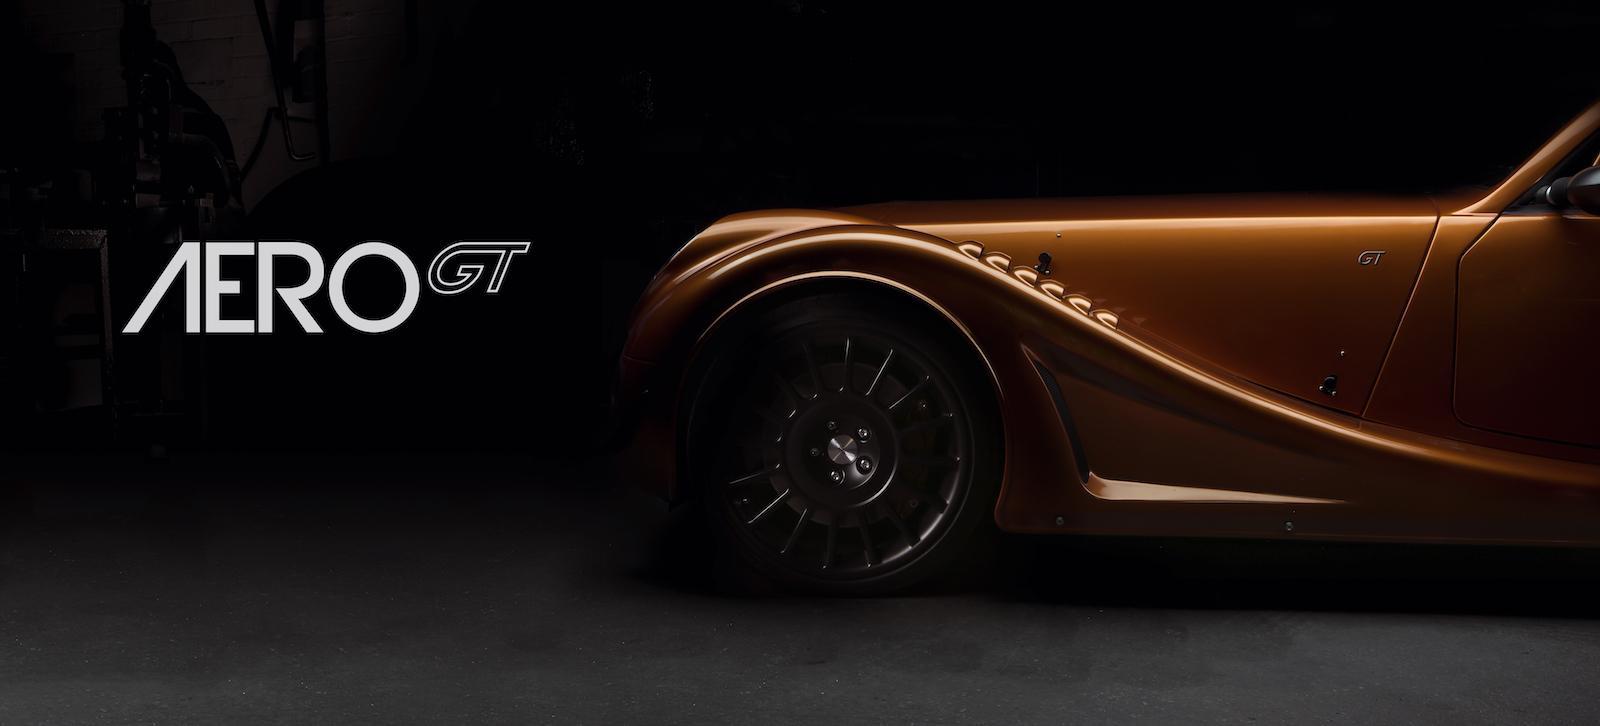 Morgan announces new 170mph Aero GT